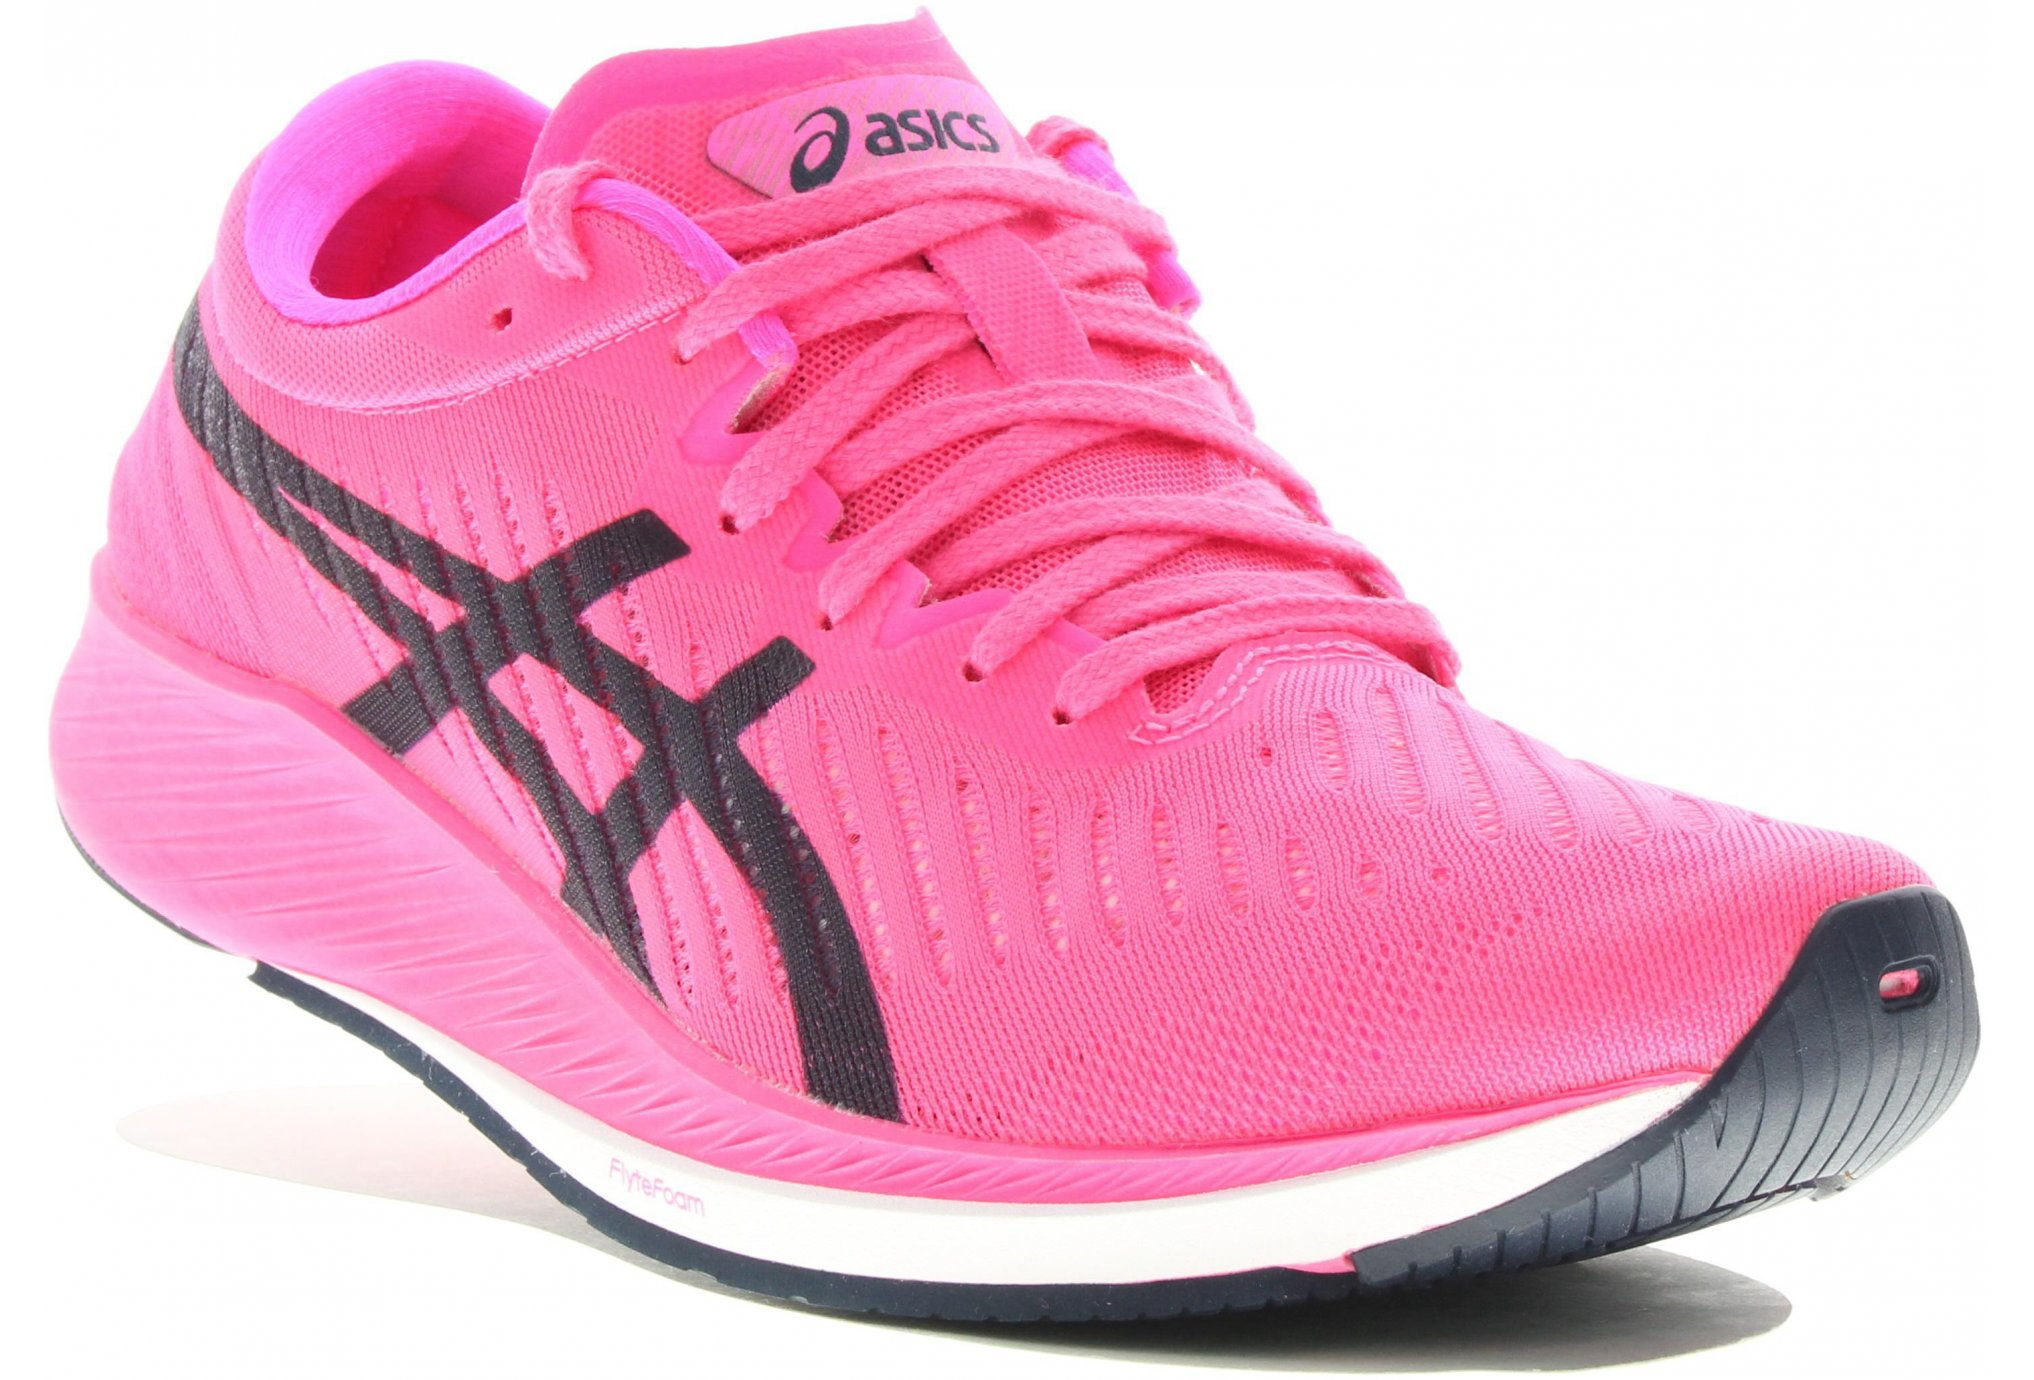 Asics Metaracer Chaussures running femme